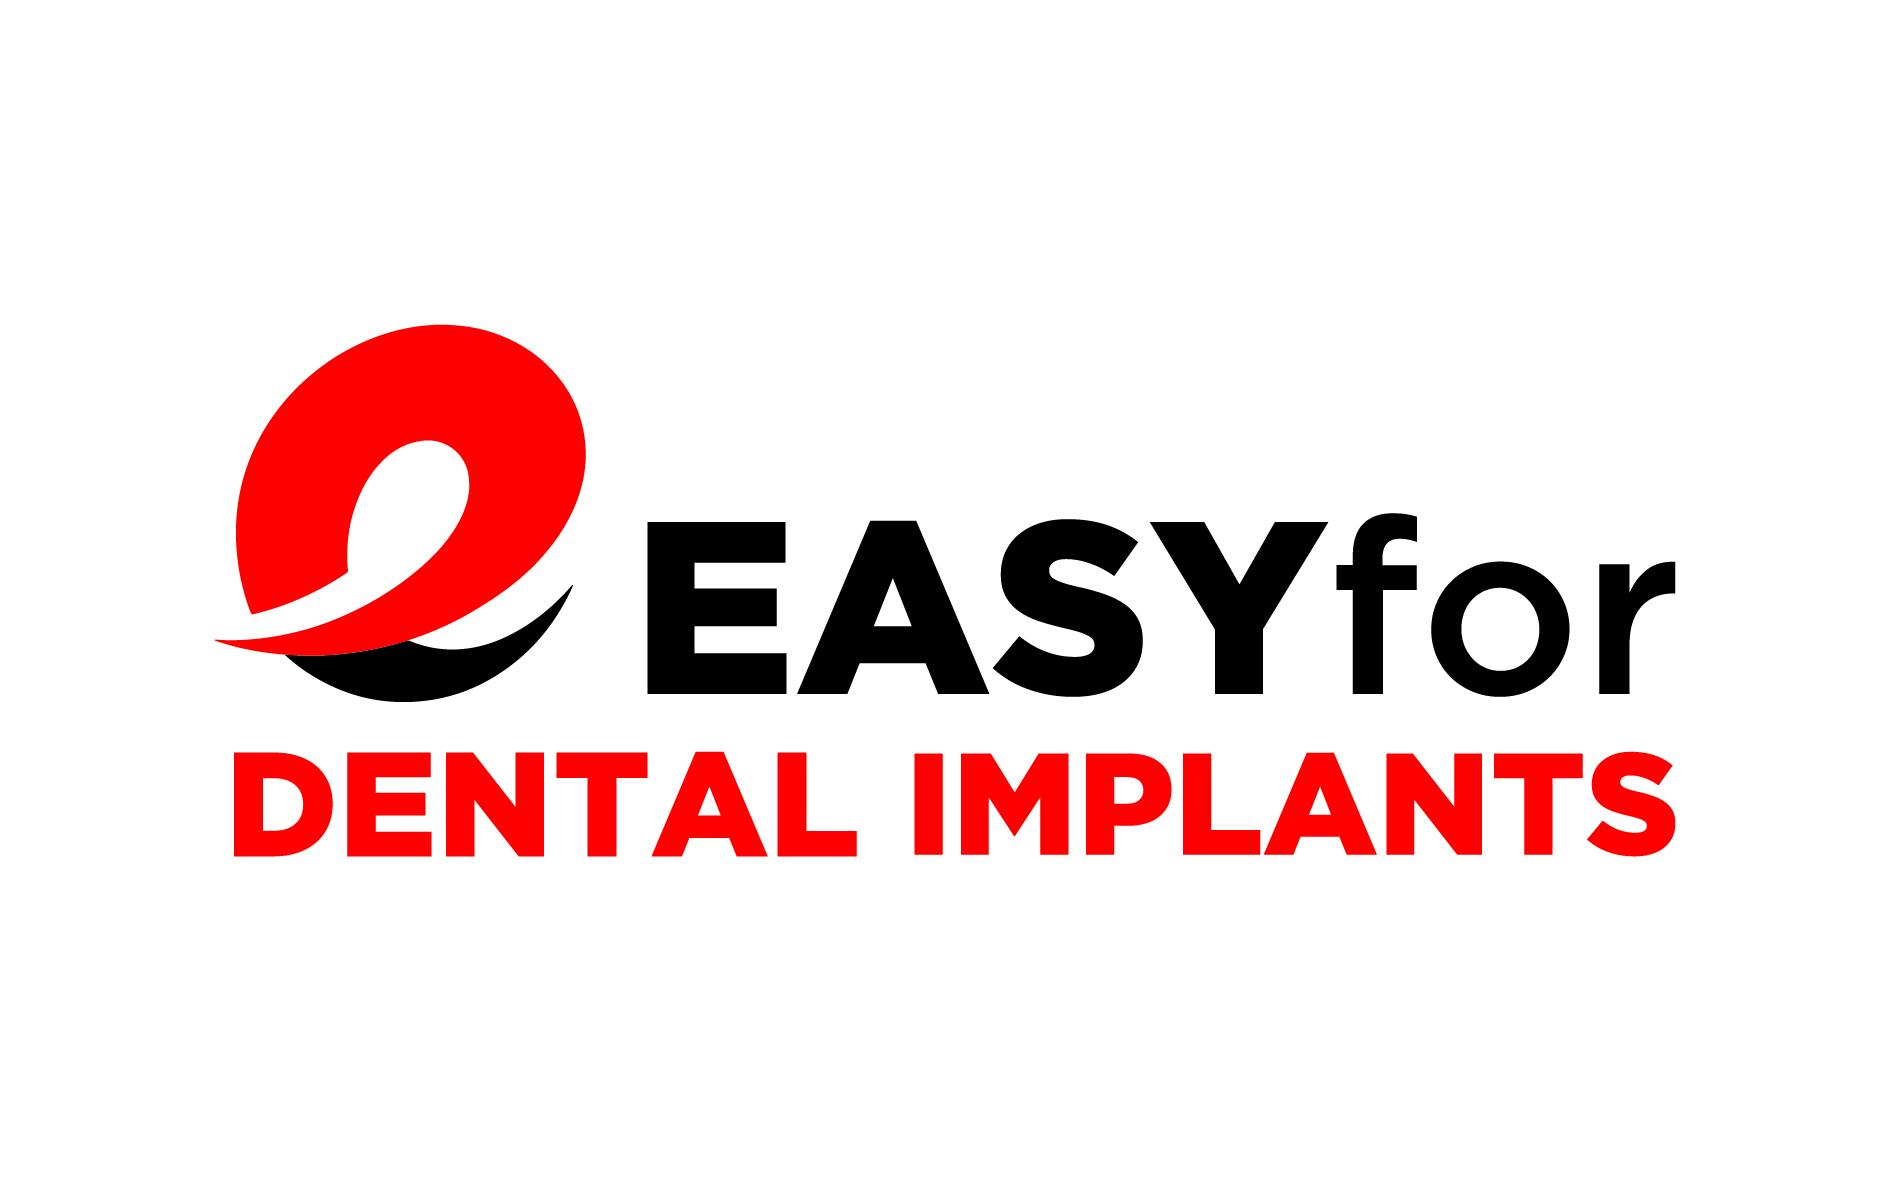 Easyfor Dental Implants